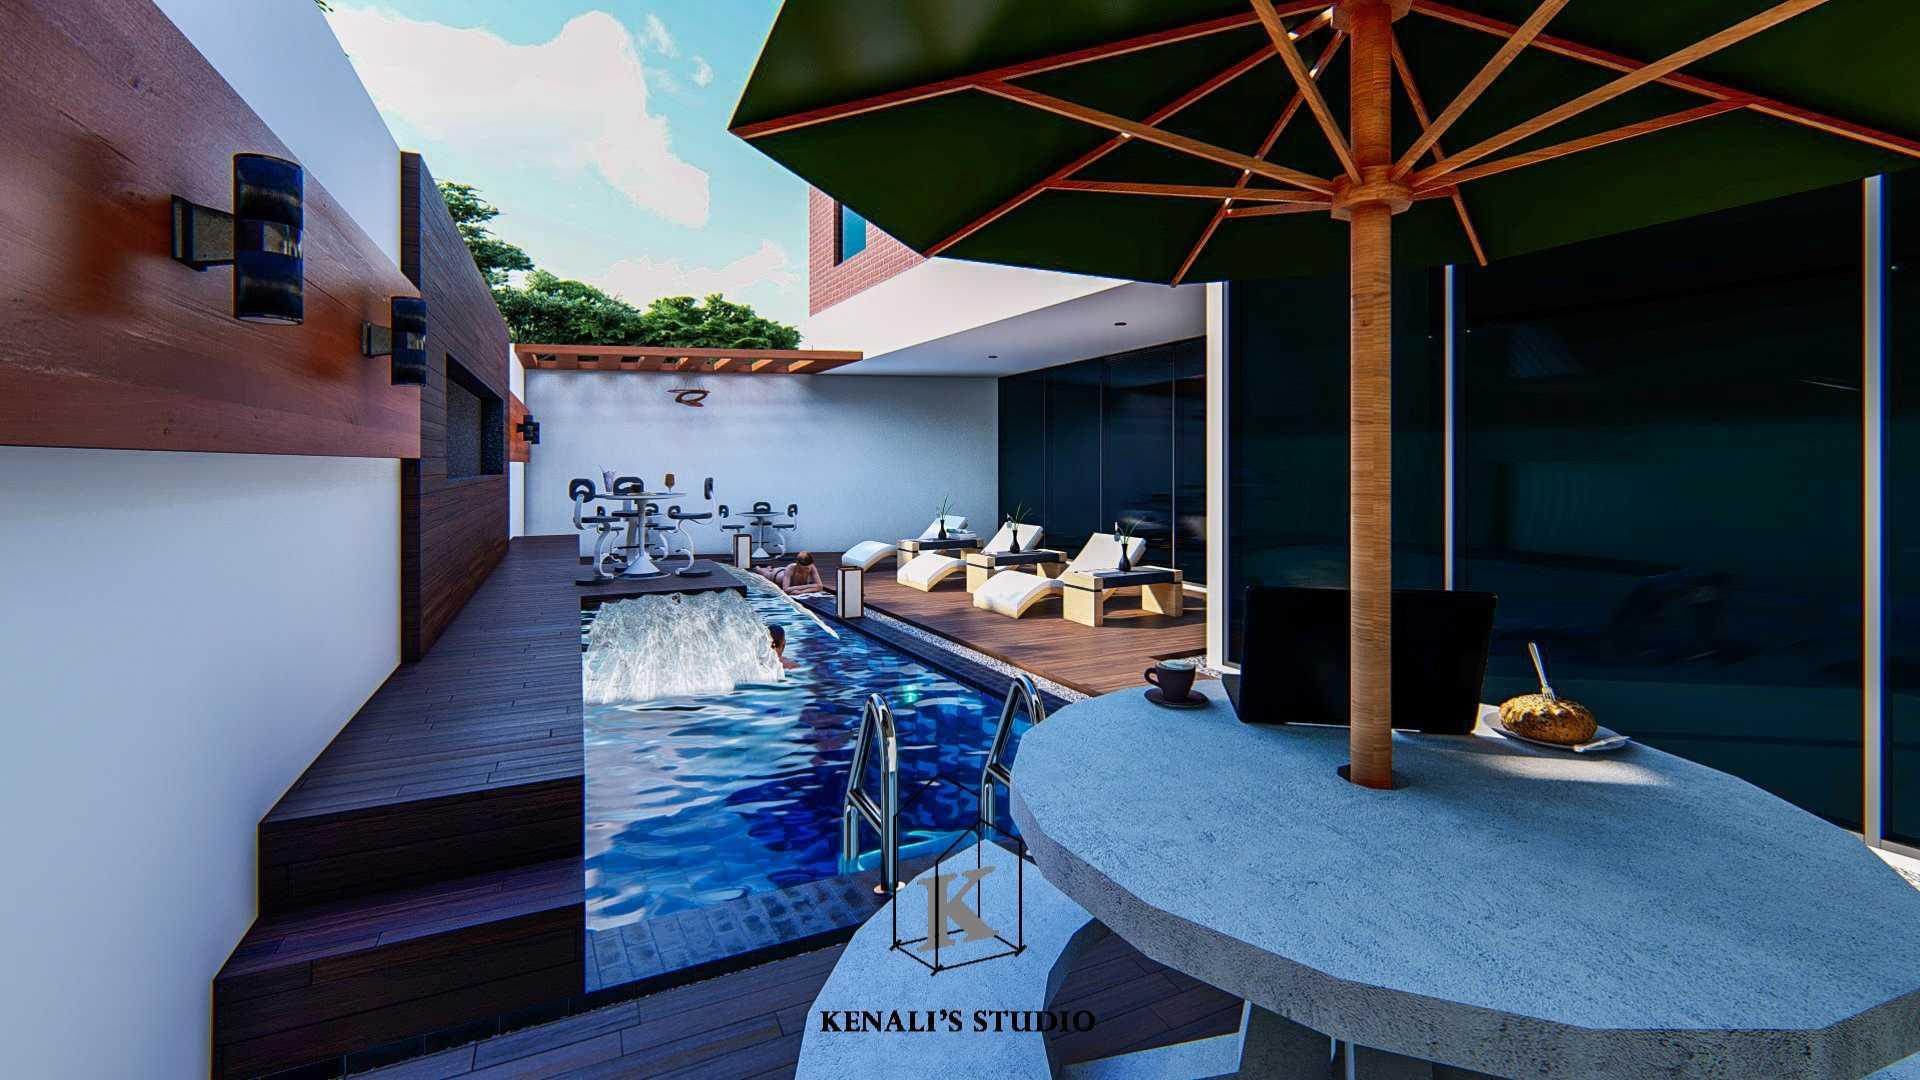 "Kenali's Studio ""hidden Treasure"" Project : Swimming Pool Kuwait Kuwait Kenalis-Studio-Hidden-Treasure-Project-Swimming-Pool   72934"